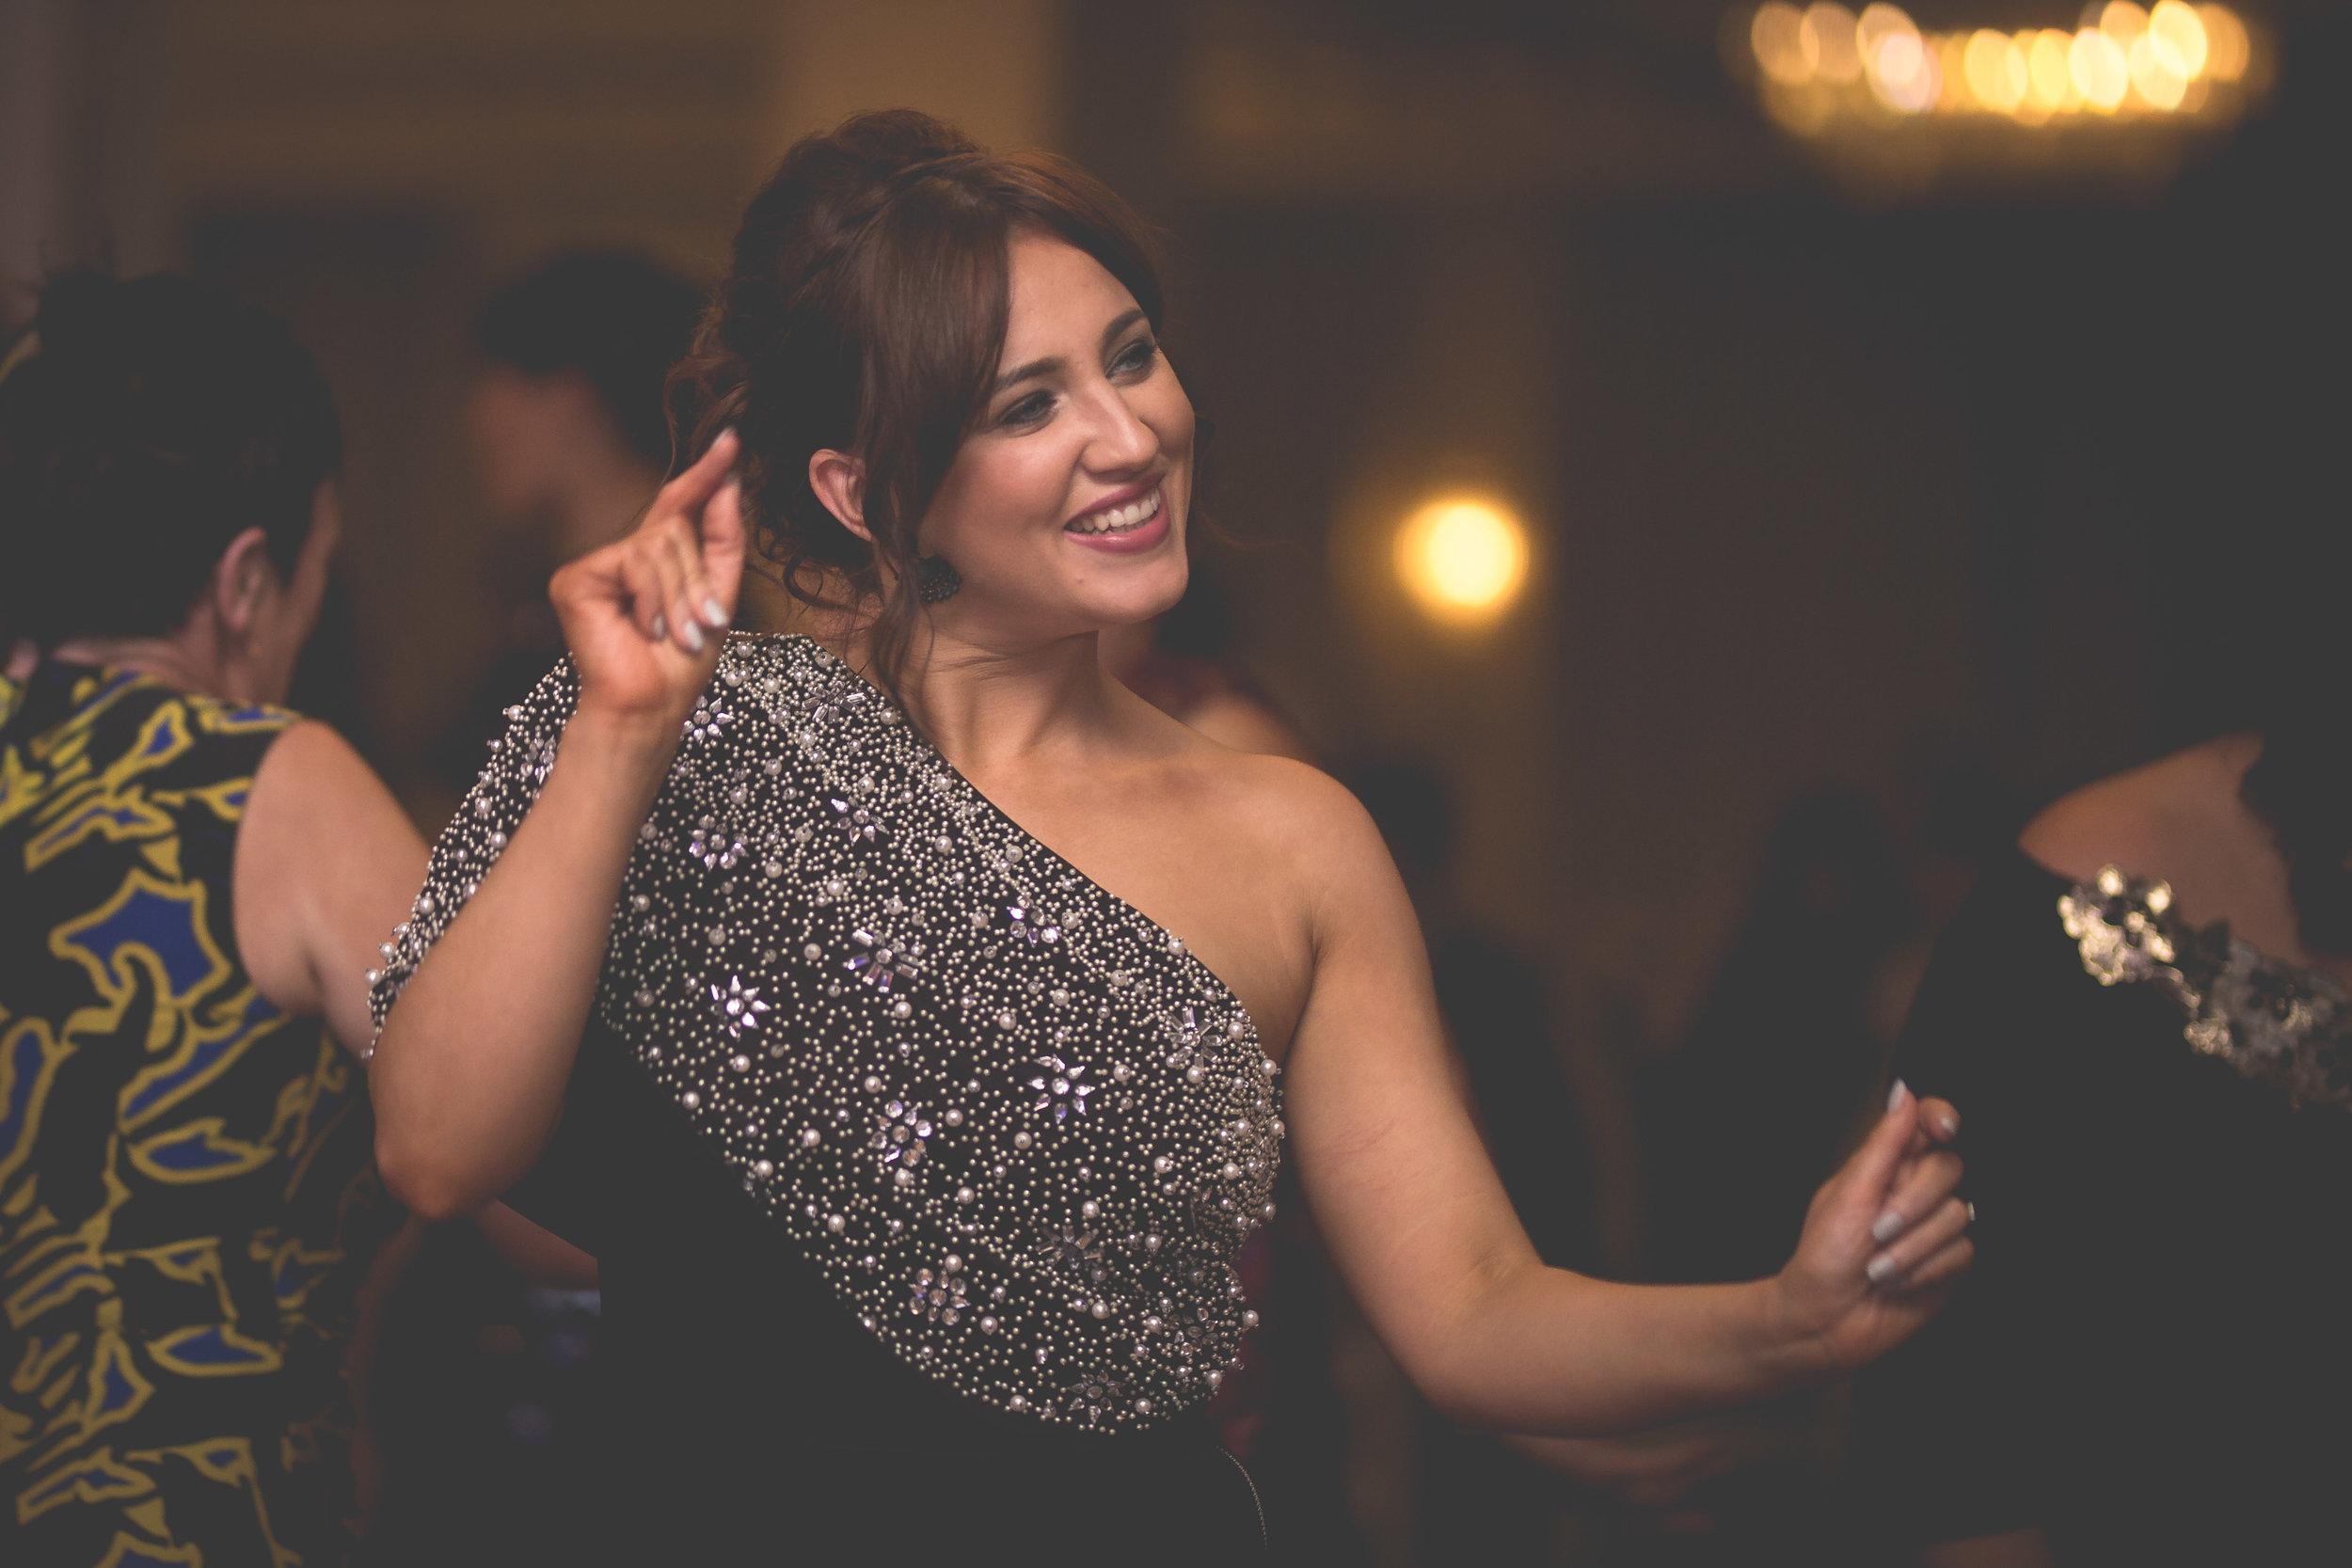 MaryJo_Conor_Mageean_Dancing-11.jpg